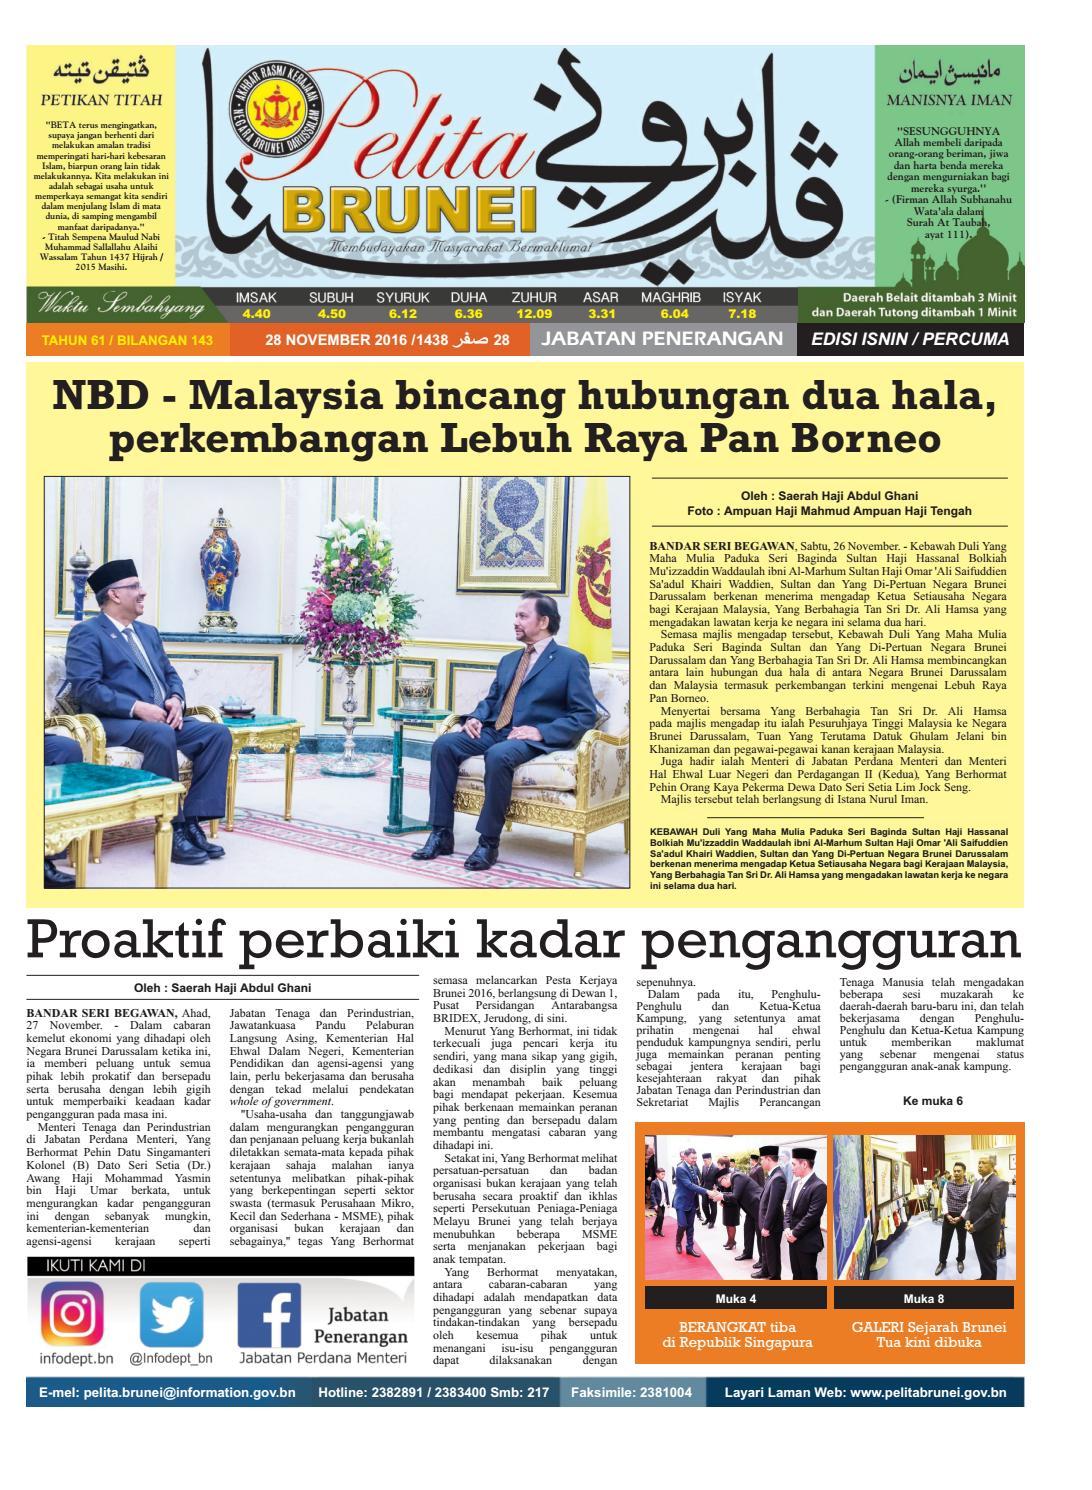 Pelita Brunei Isnin 28 Nov 2016 By Putera Katak Brunei Issuu